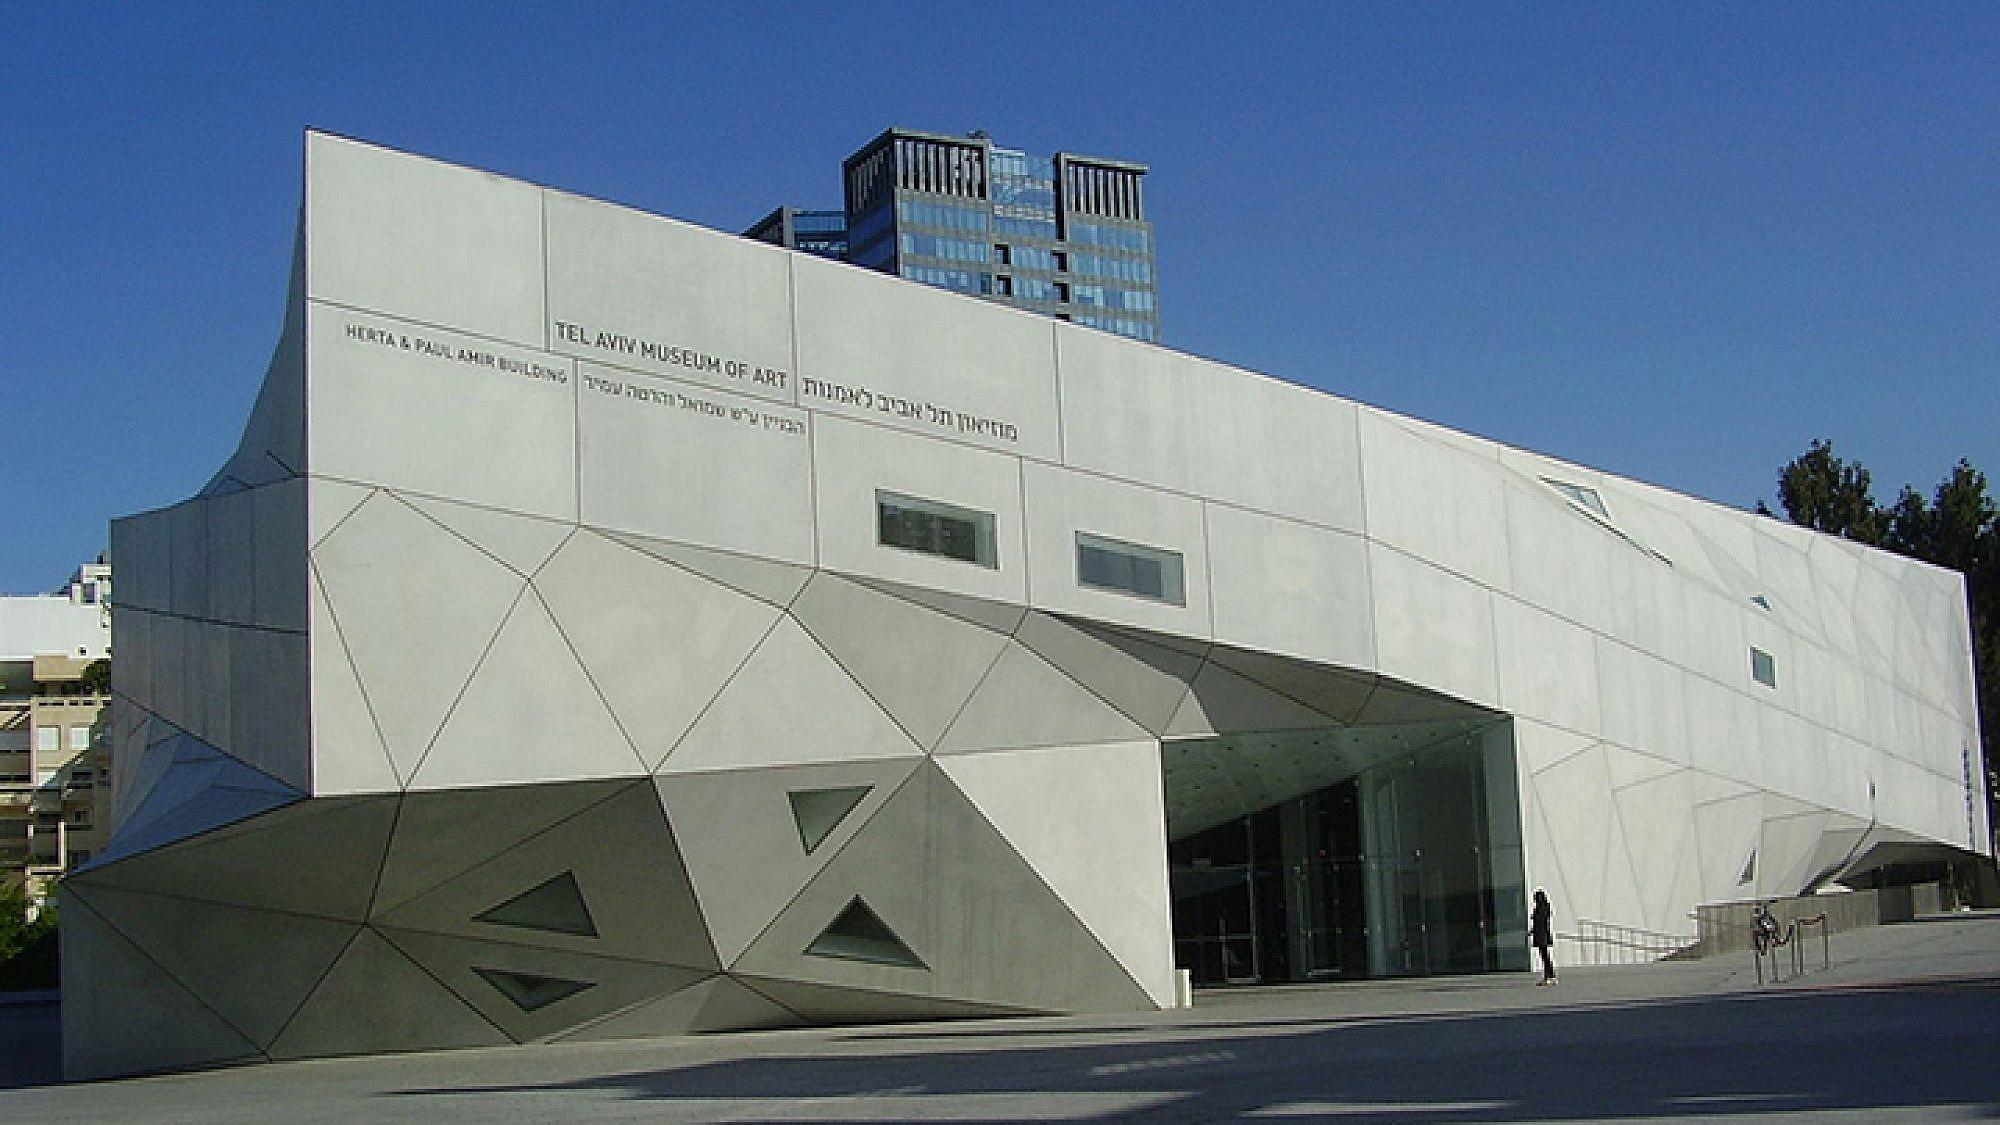 מוזיאון תל אביב. צילום: אבישי טייכר